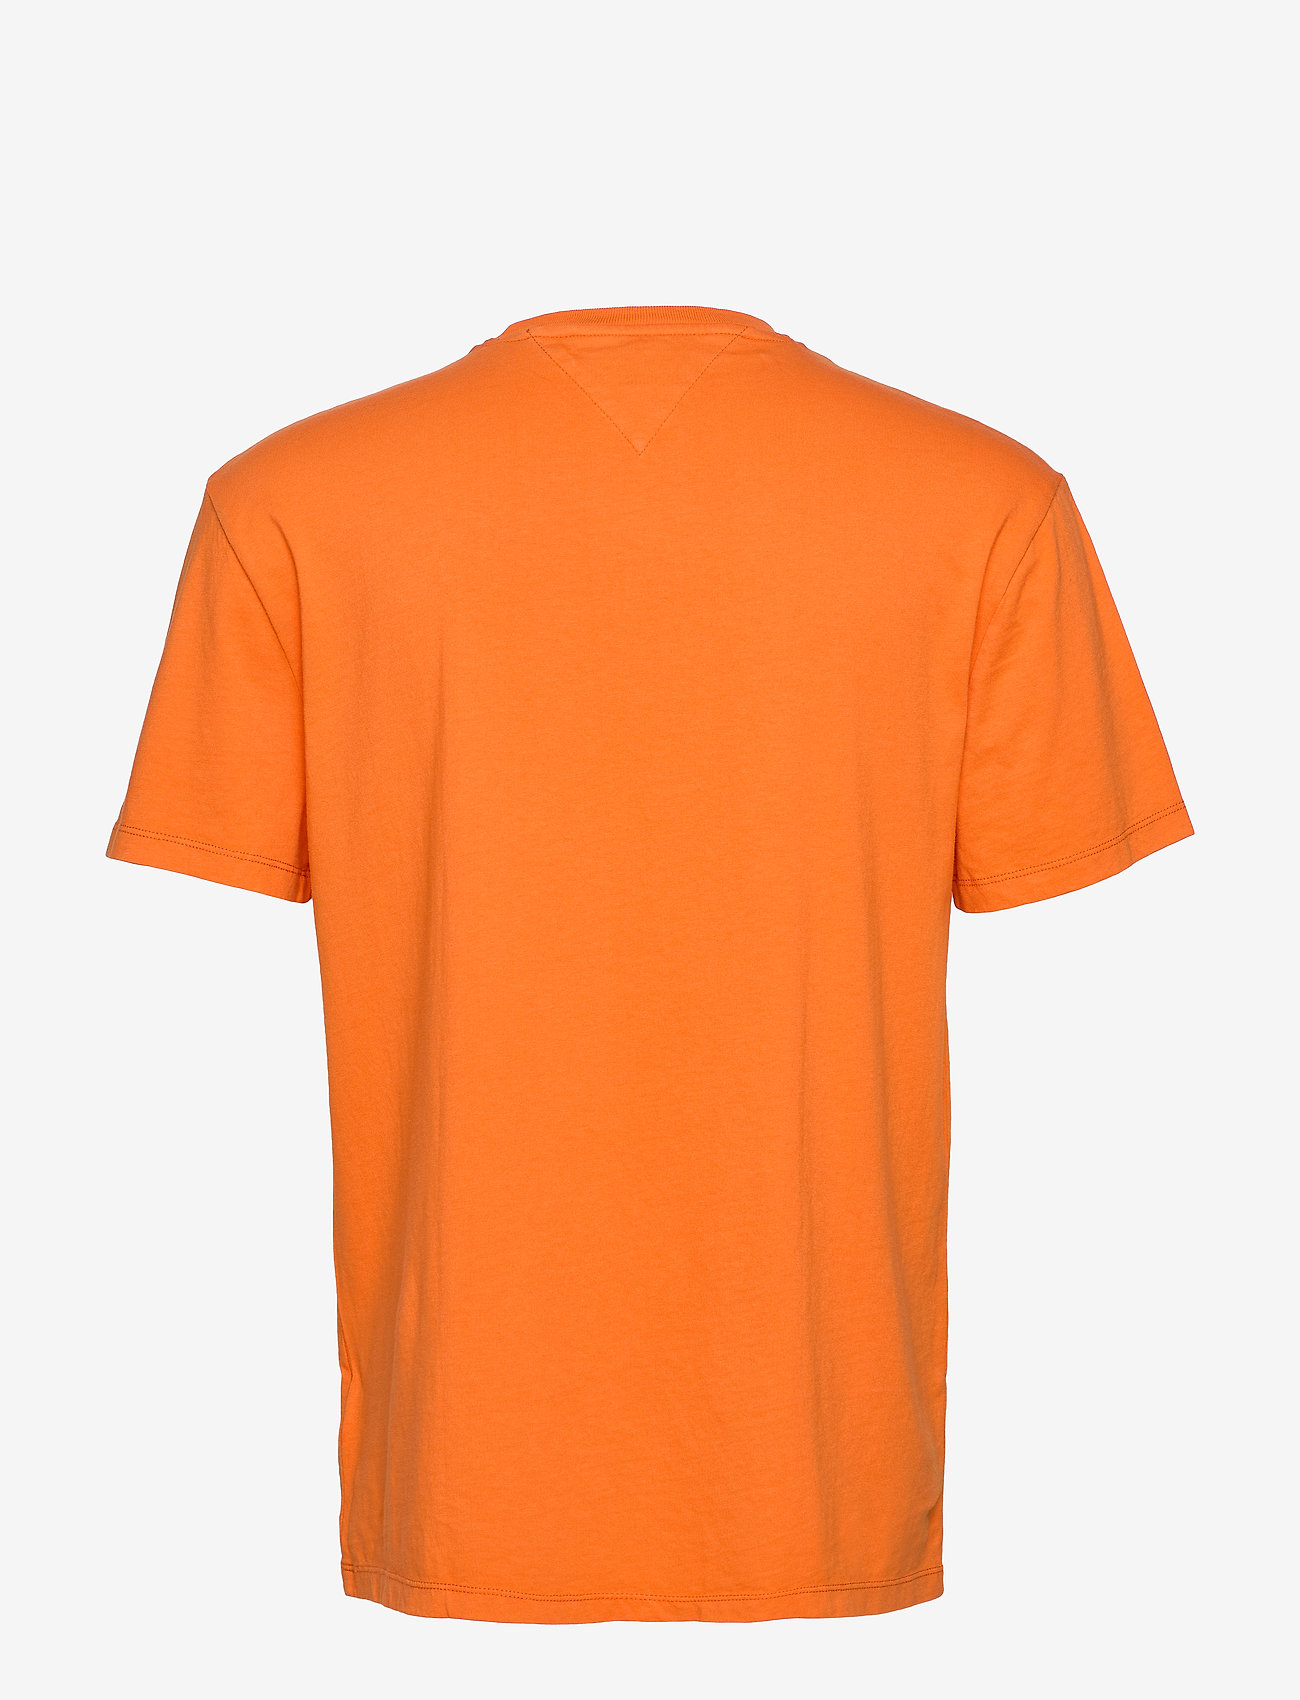 Tommy Jeans - TJM WHITE BOX LOGO TEE - short-sleeved t-shirts - bonfire orange - 1